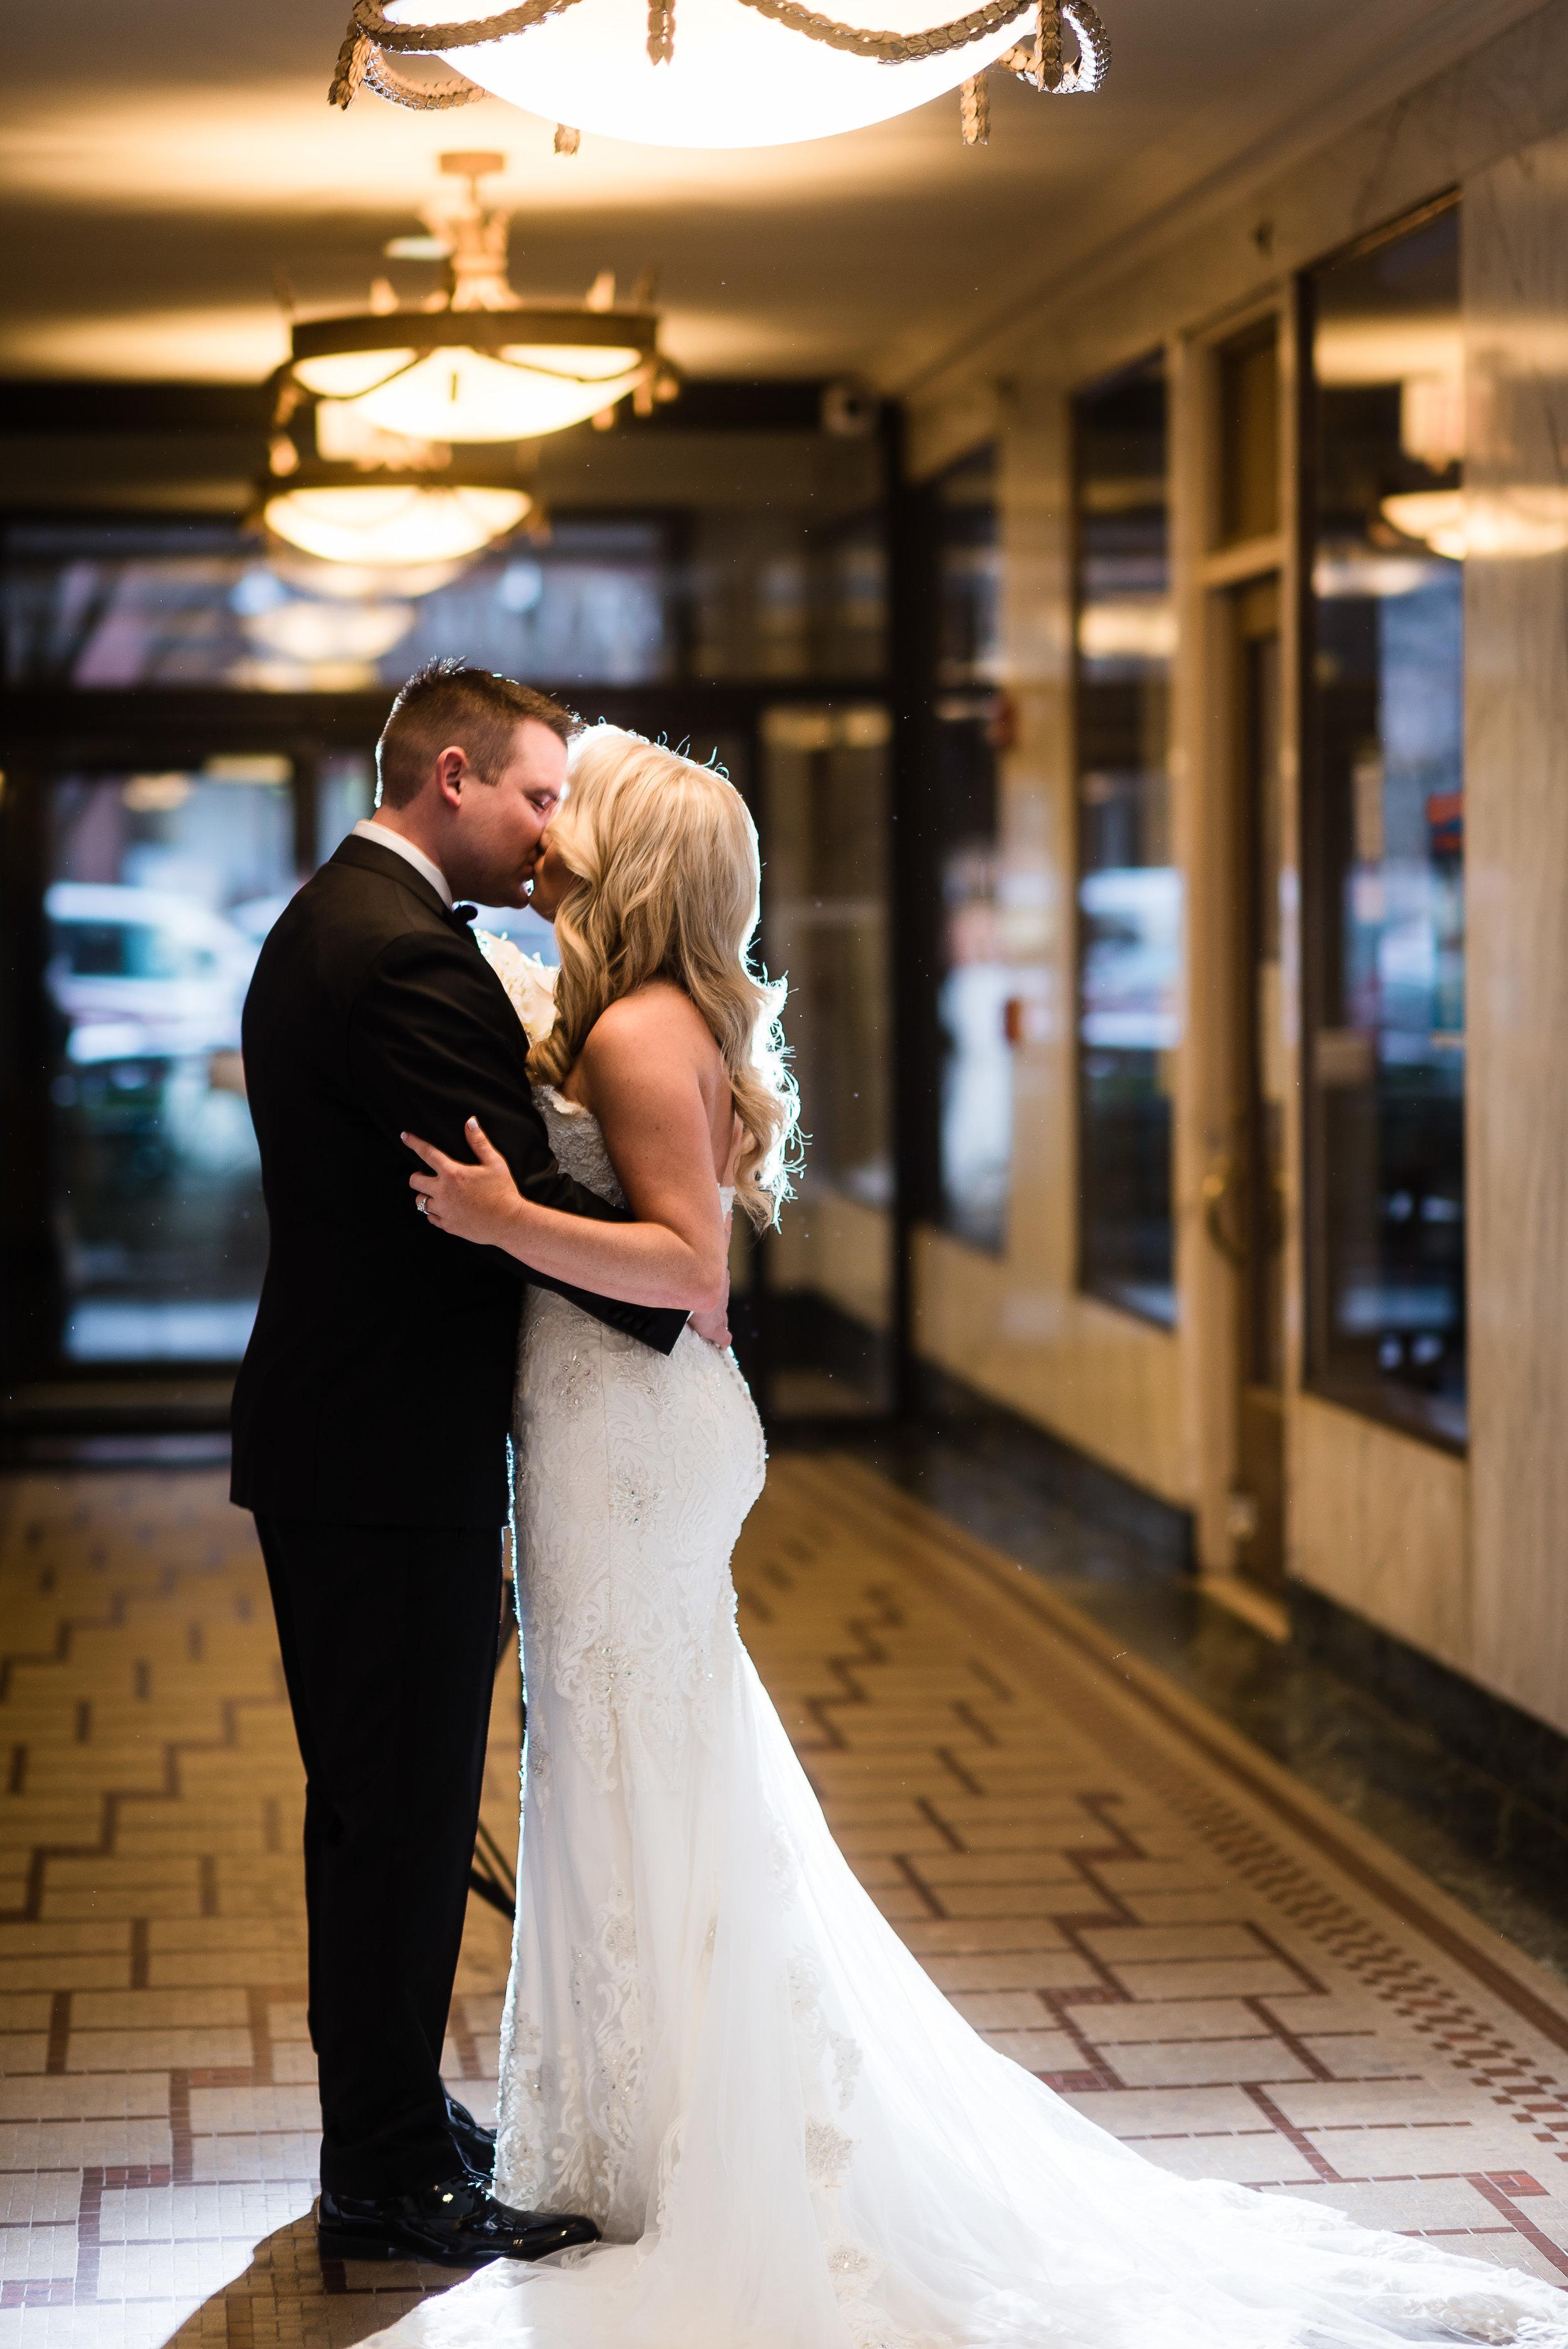 20181231_new_years_eve_old_cigar_warehouse_wedding_0486 1.jpg